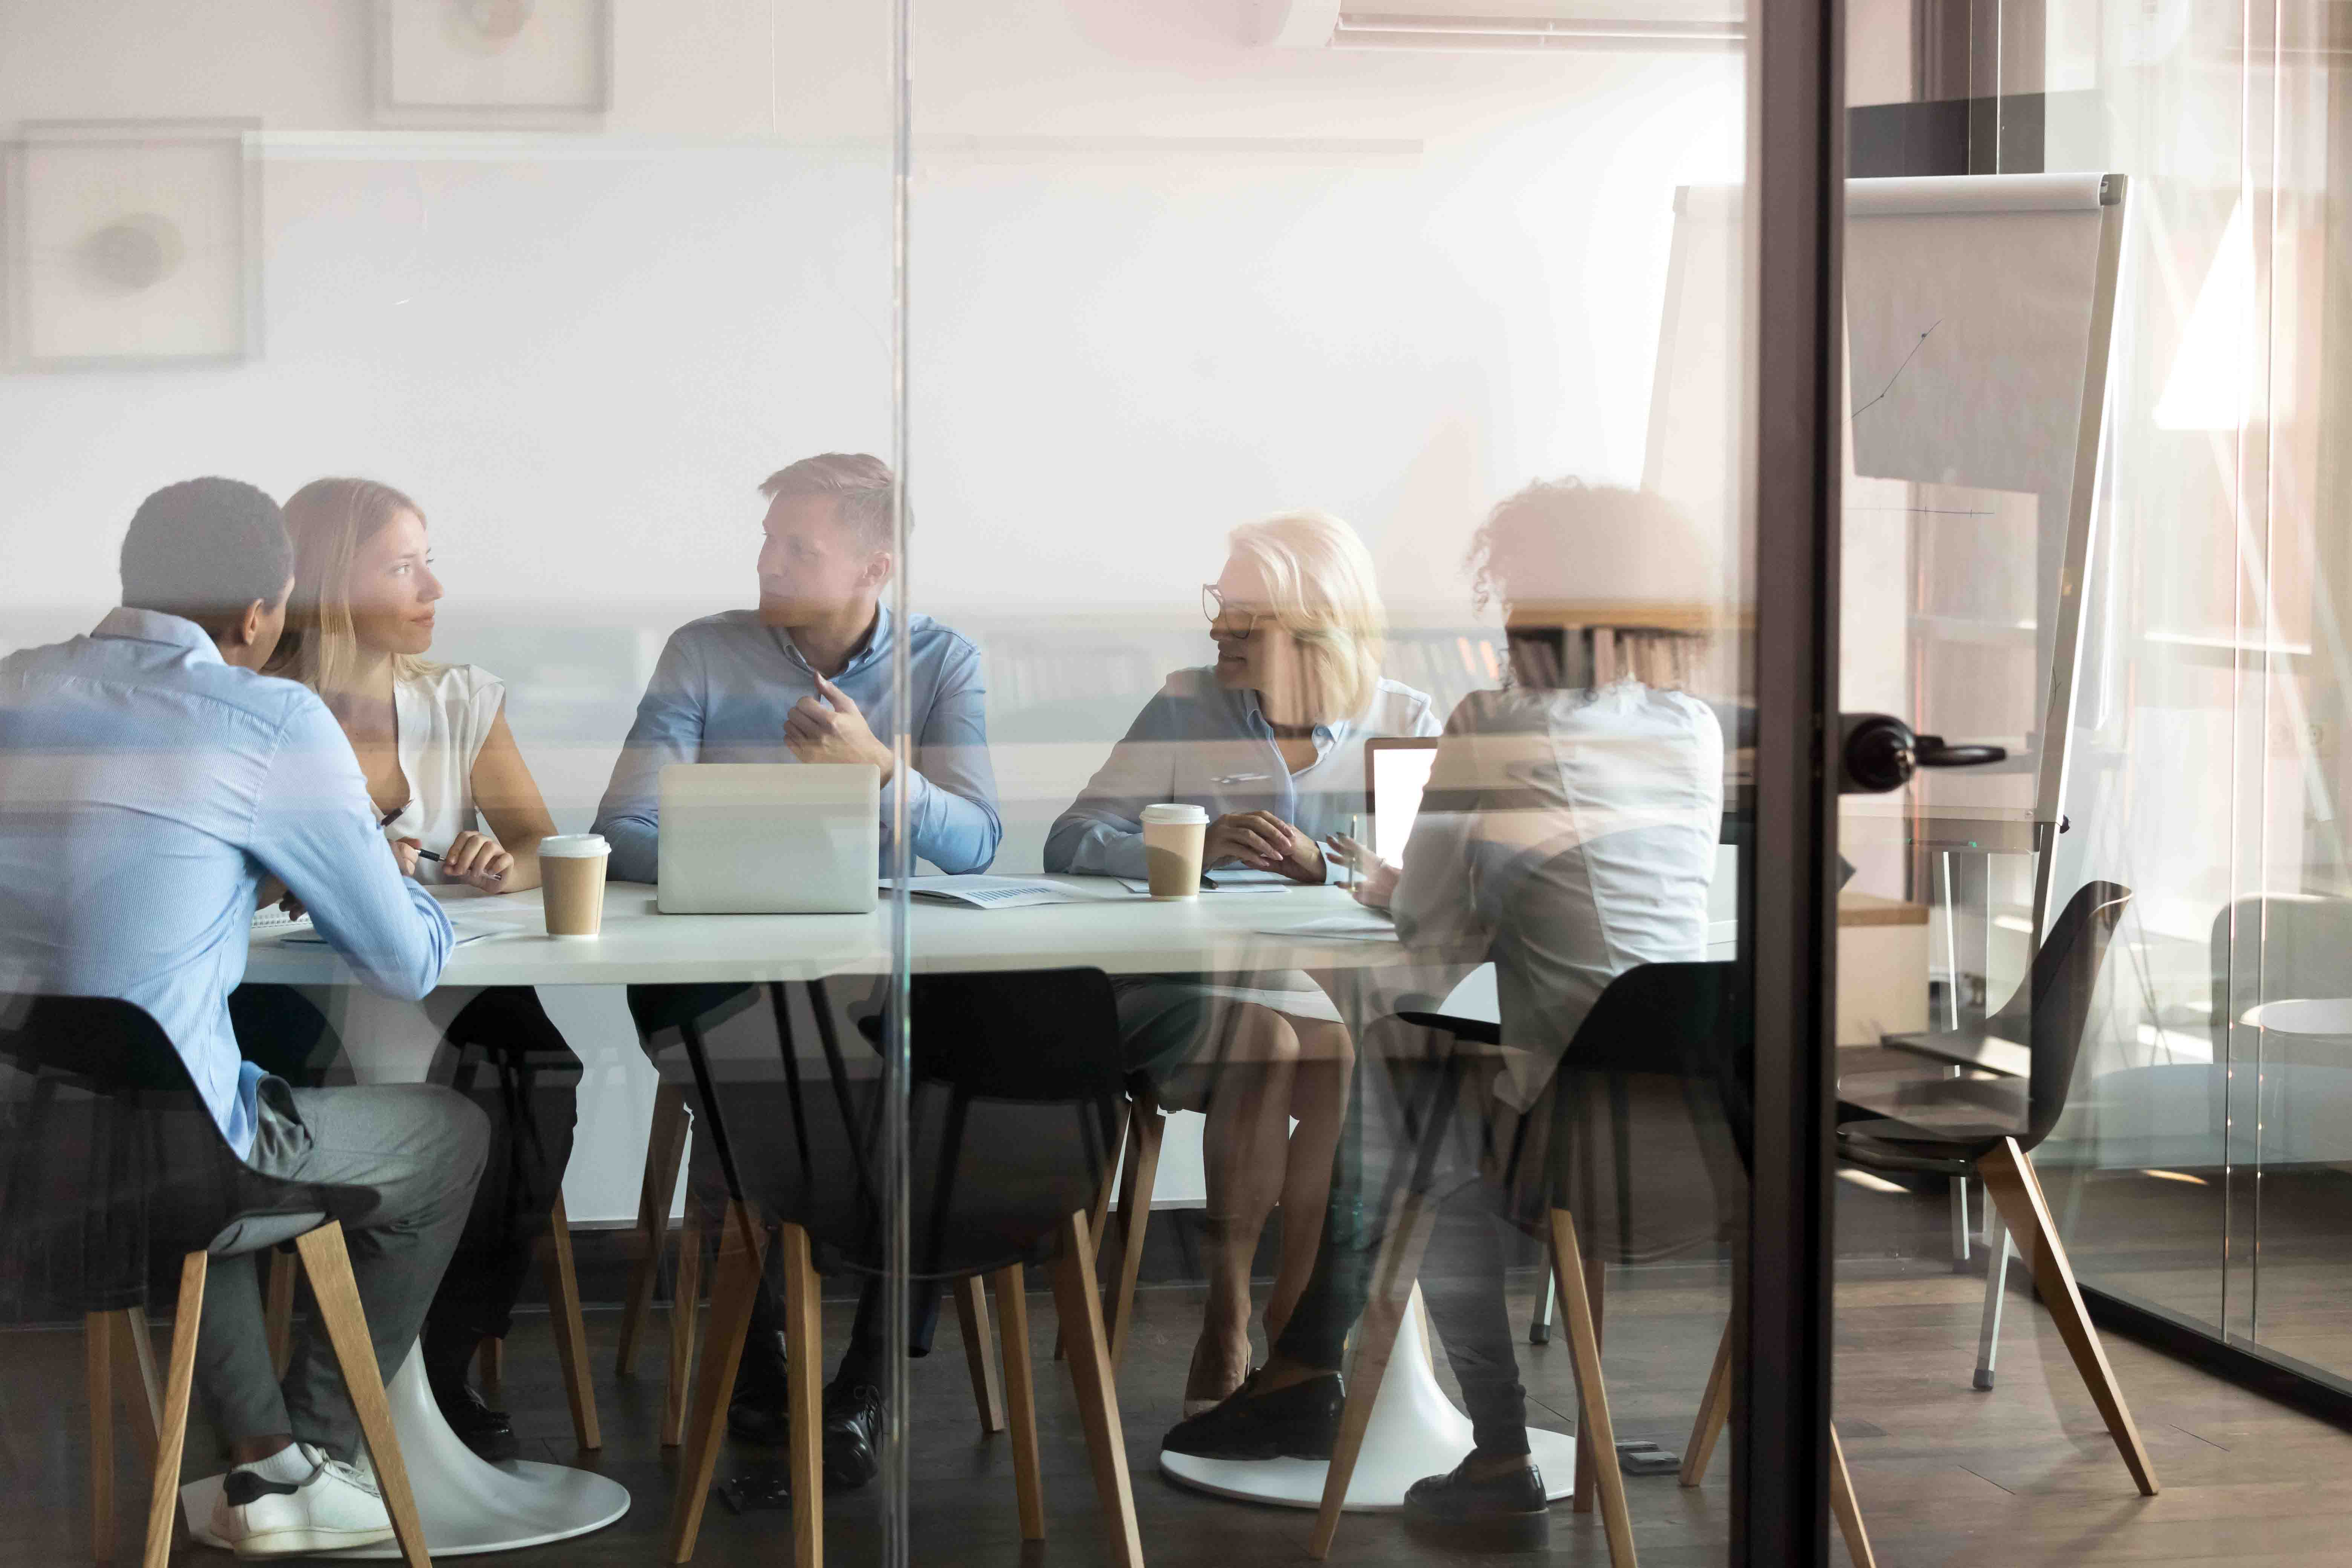 Dryrun helps internal finance teams work together